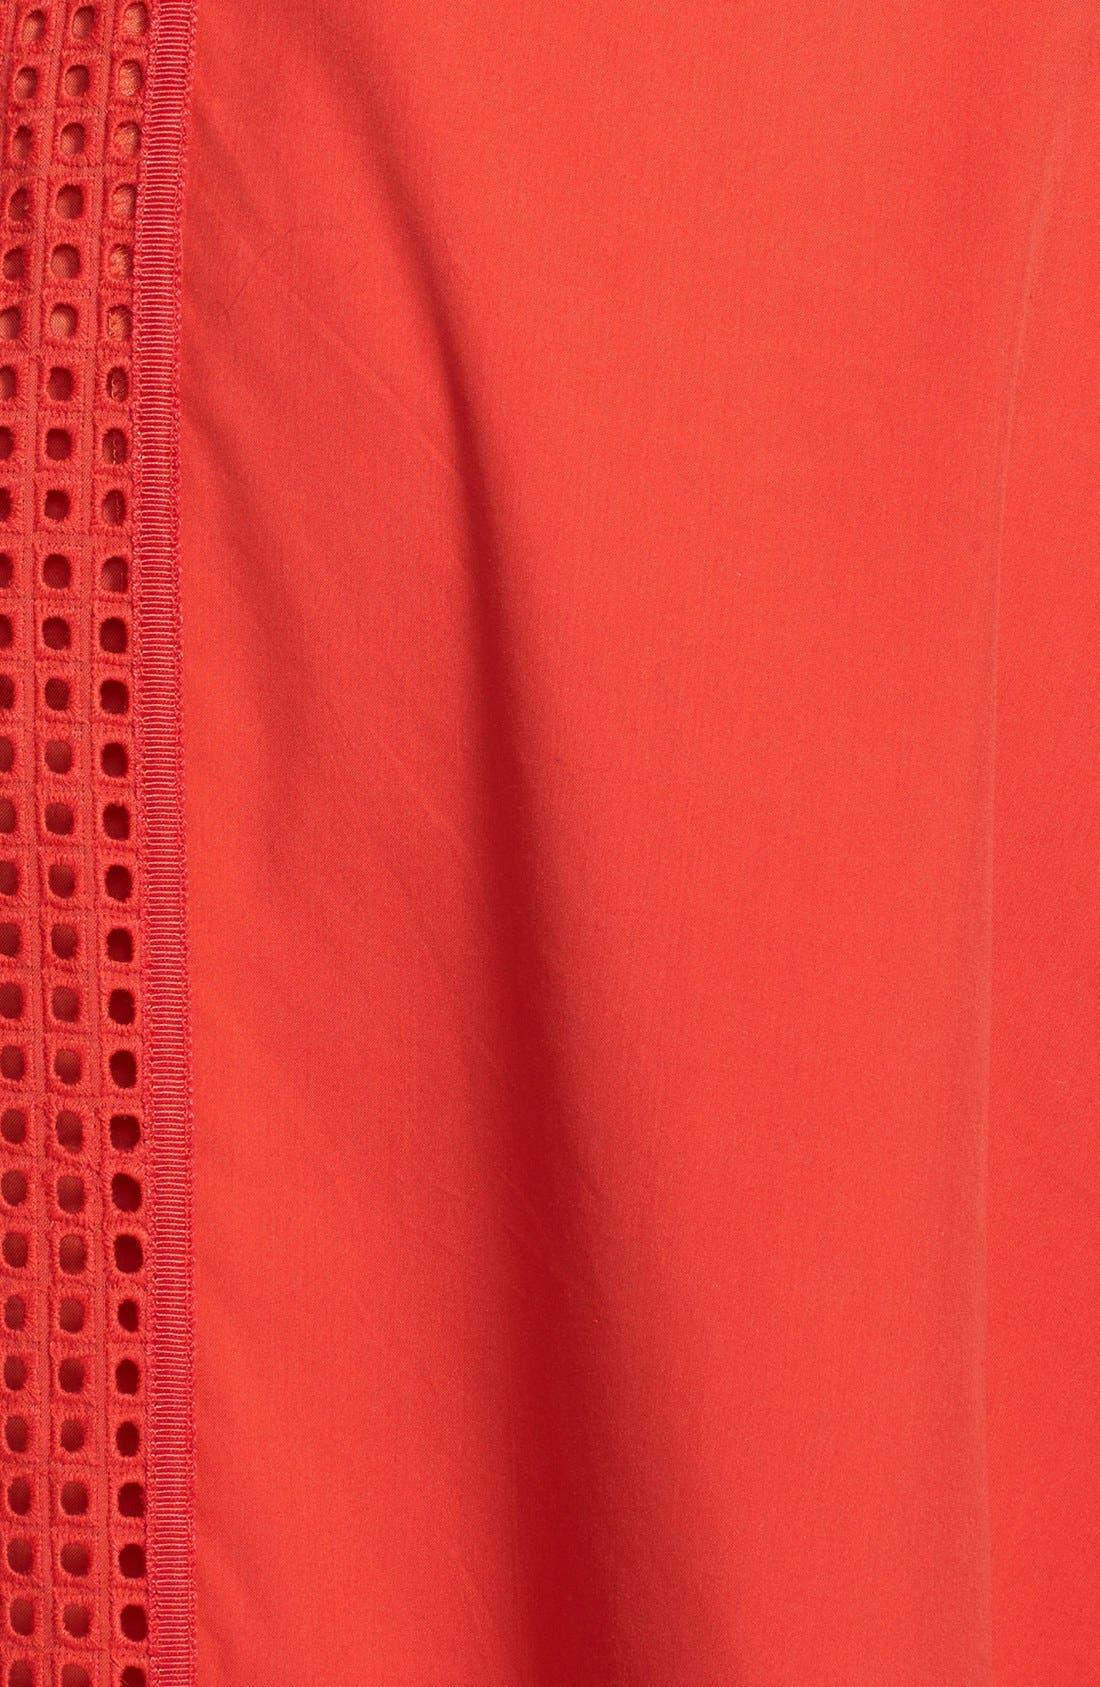 Rachel Roy Perforated Panel Cotton & Silk Poplin Dress,                             Alternate thumbnail 2, color,                             800